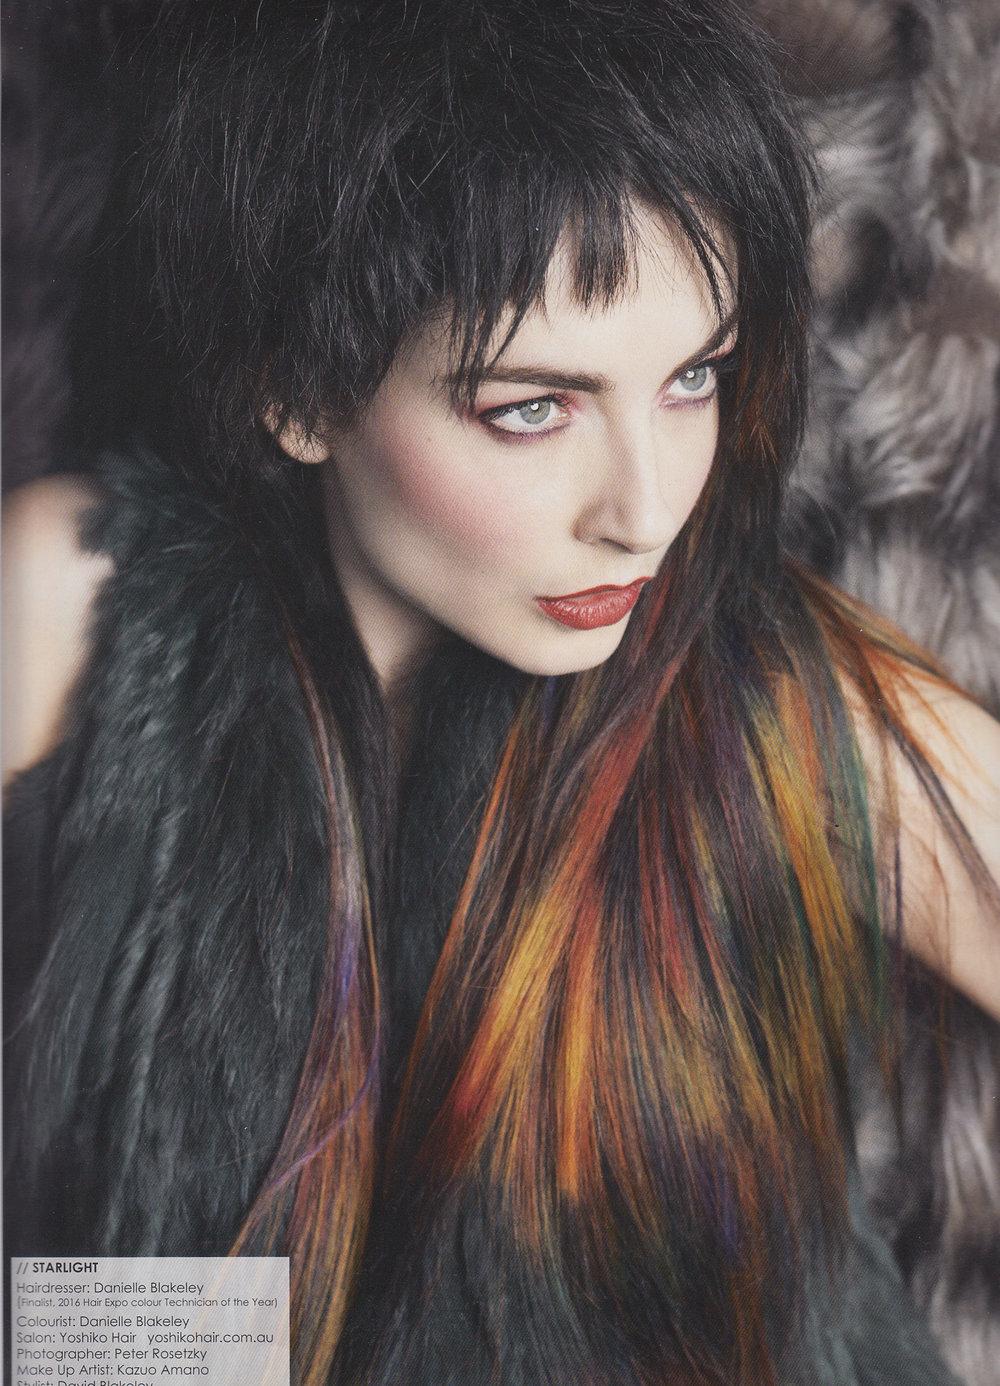 yoshikohair_stkilda_melbourne_hairdresser_hairsalon_trend17_2